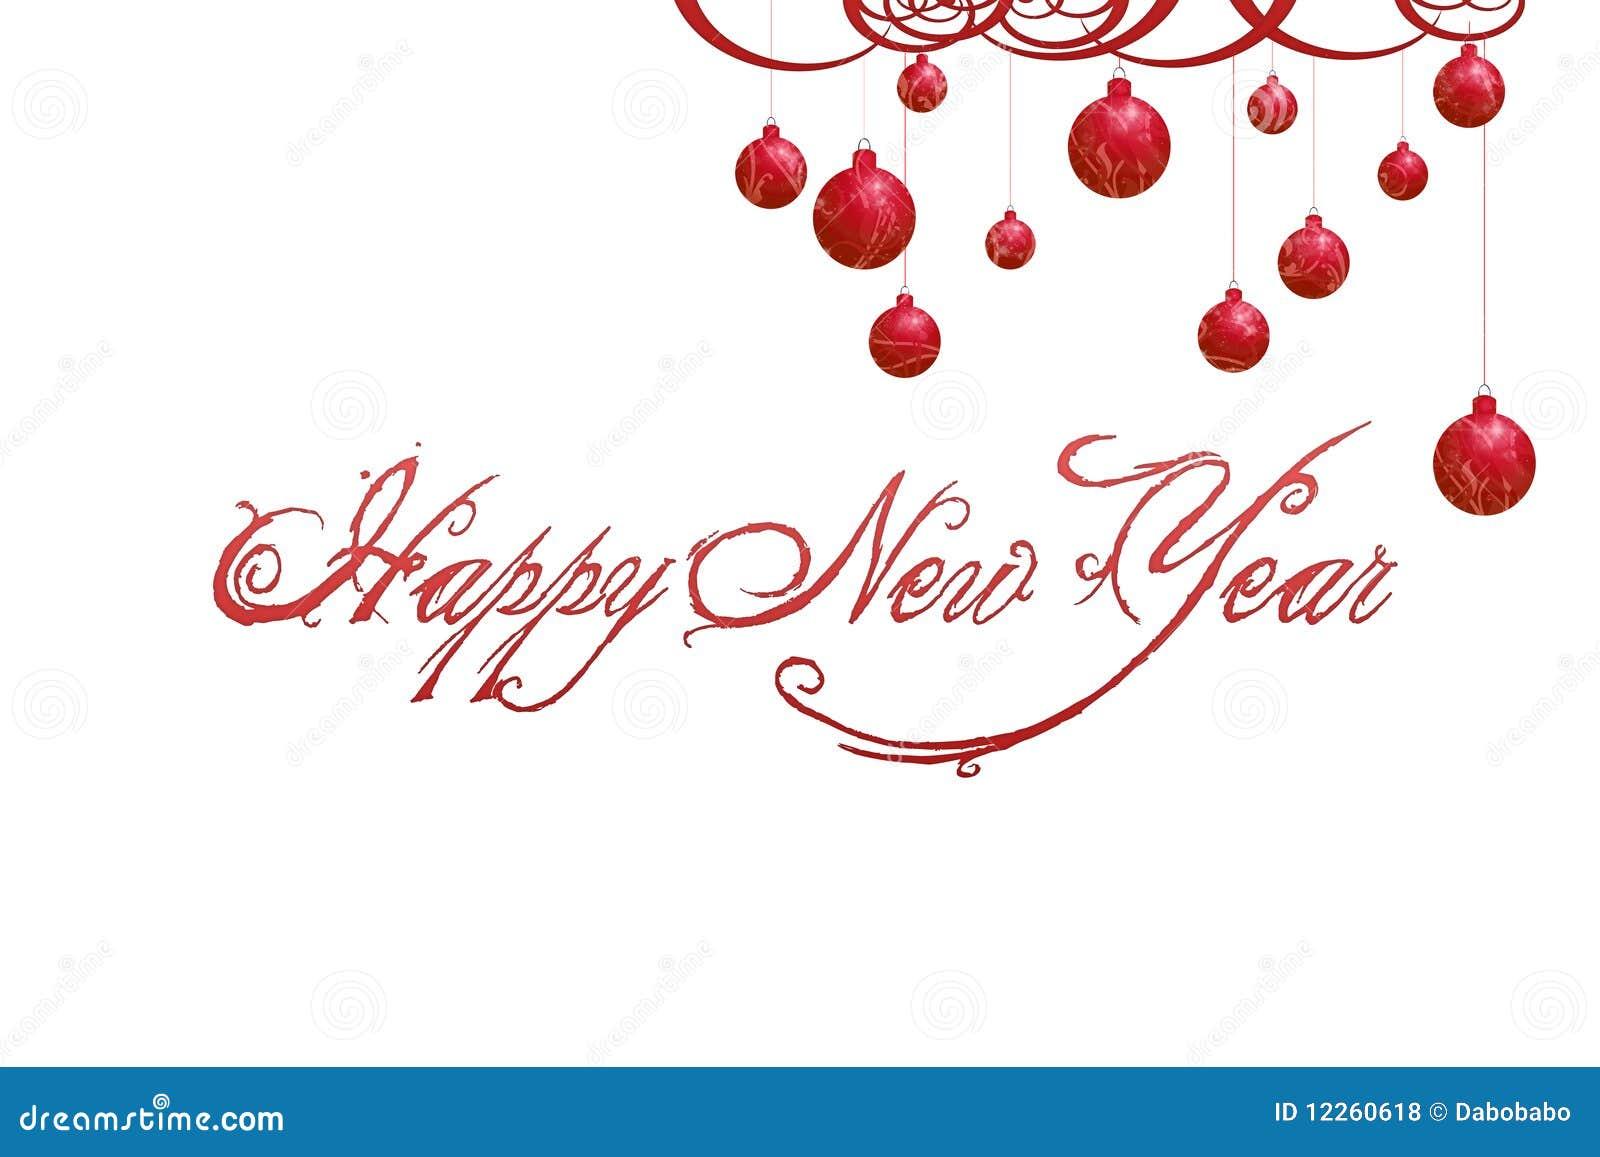 Happy New Year Elegant Images 30